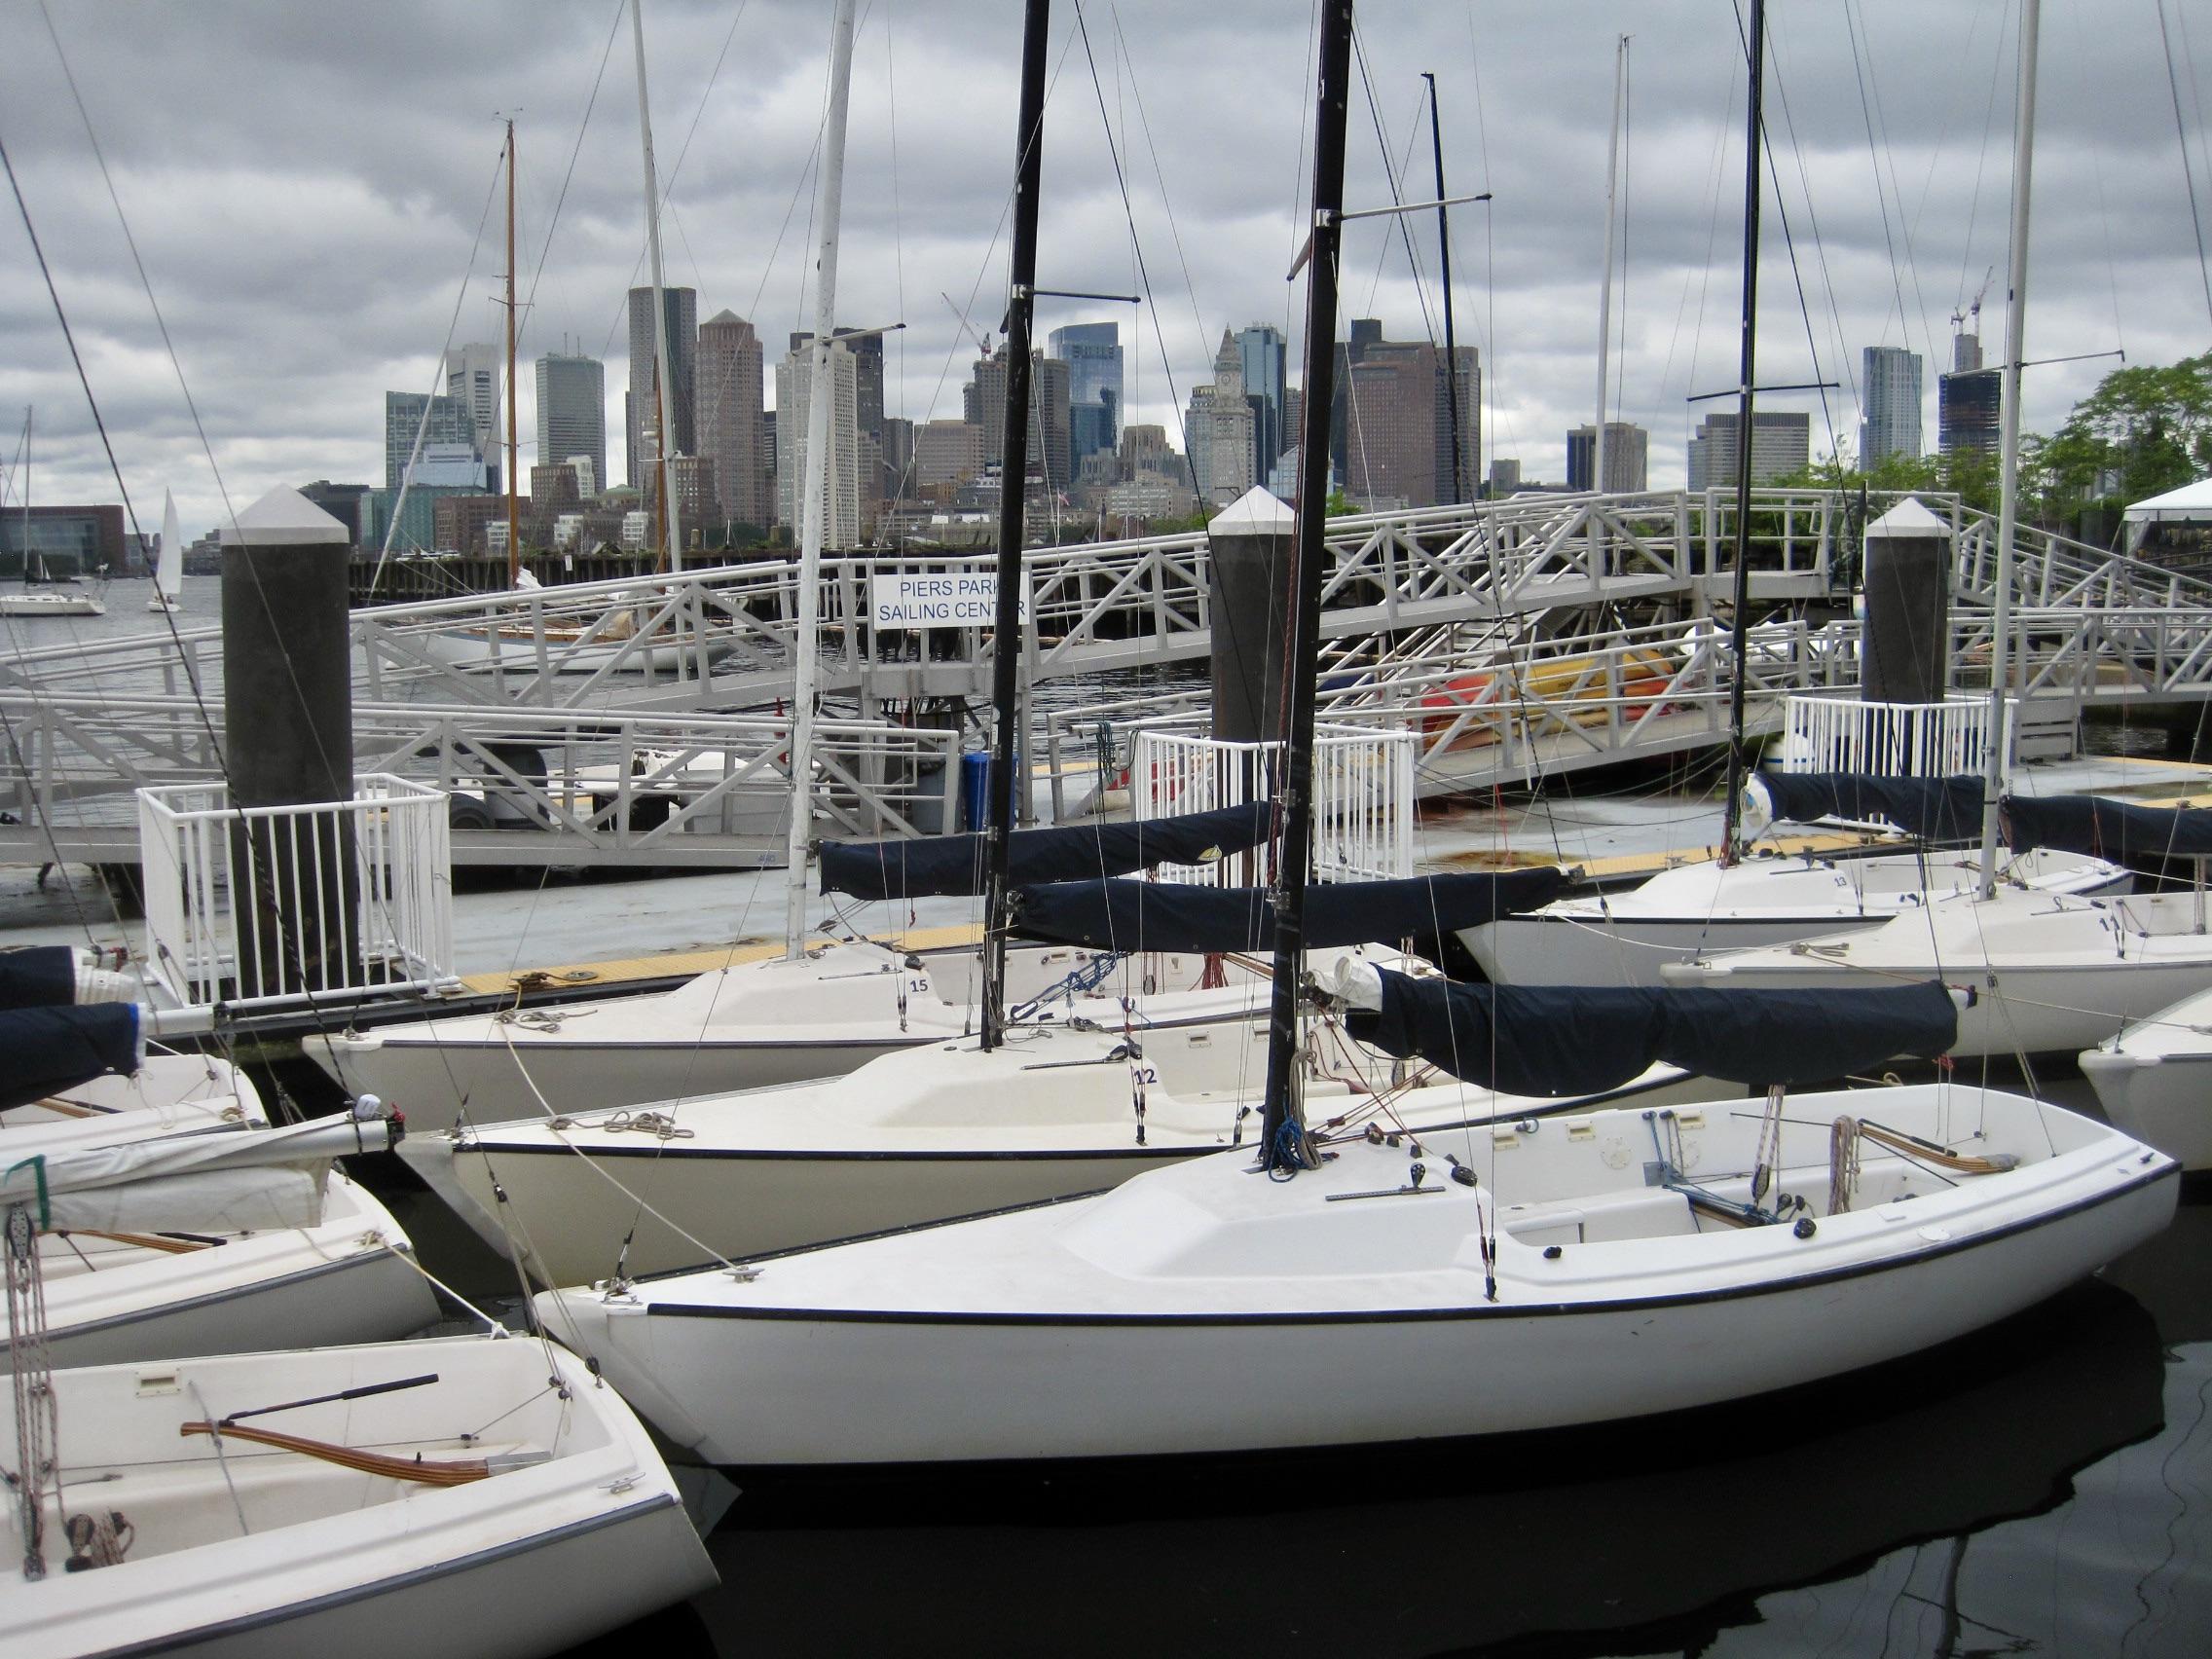 Piers Park Sailing Center on Jeffries Point